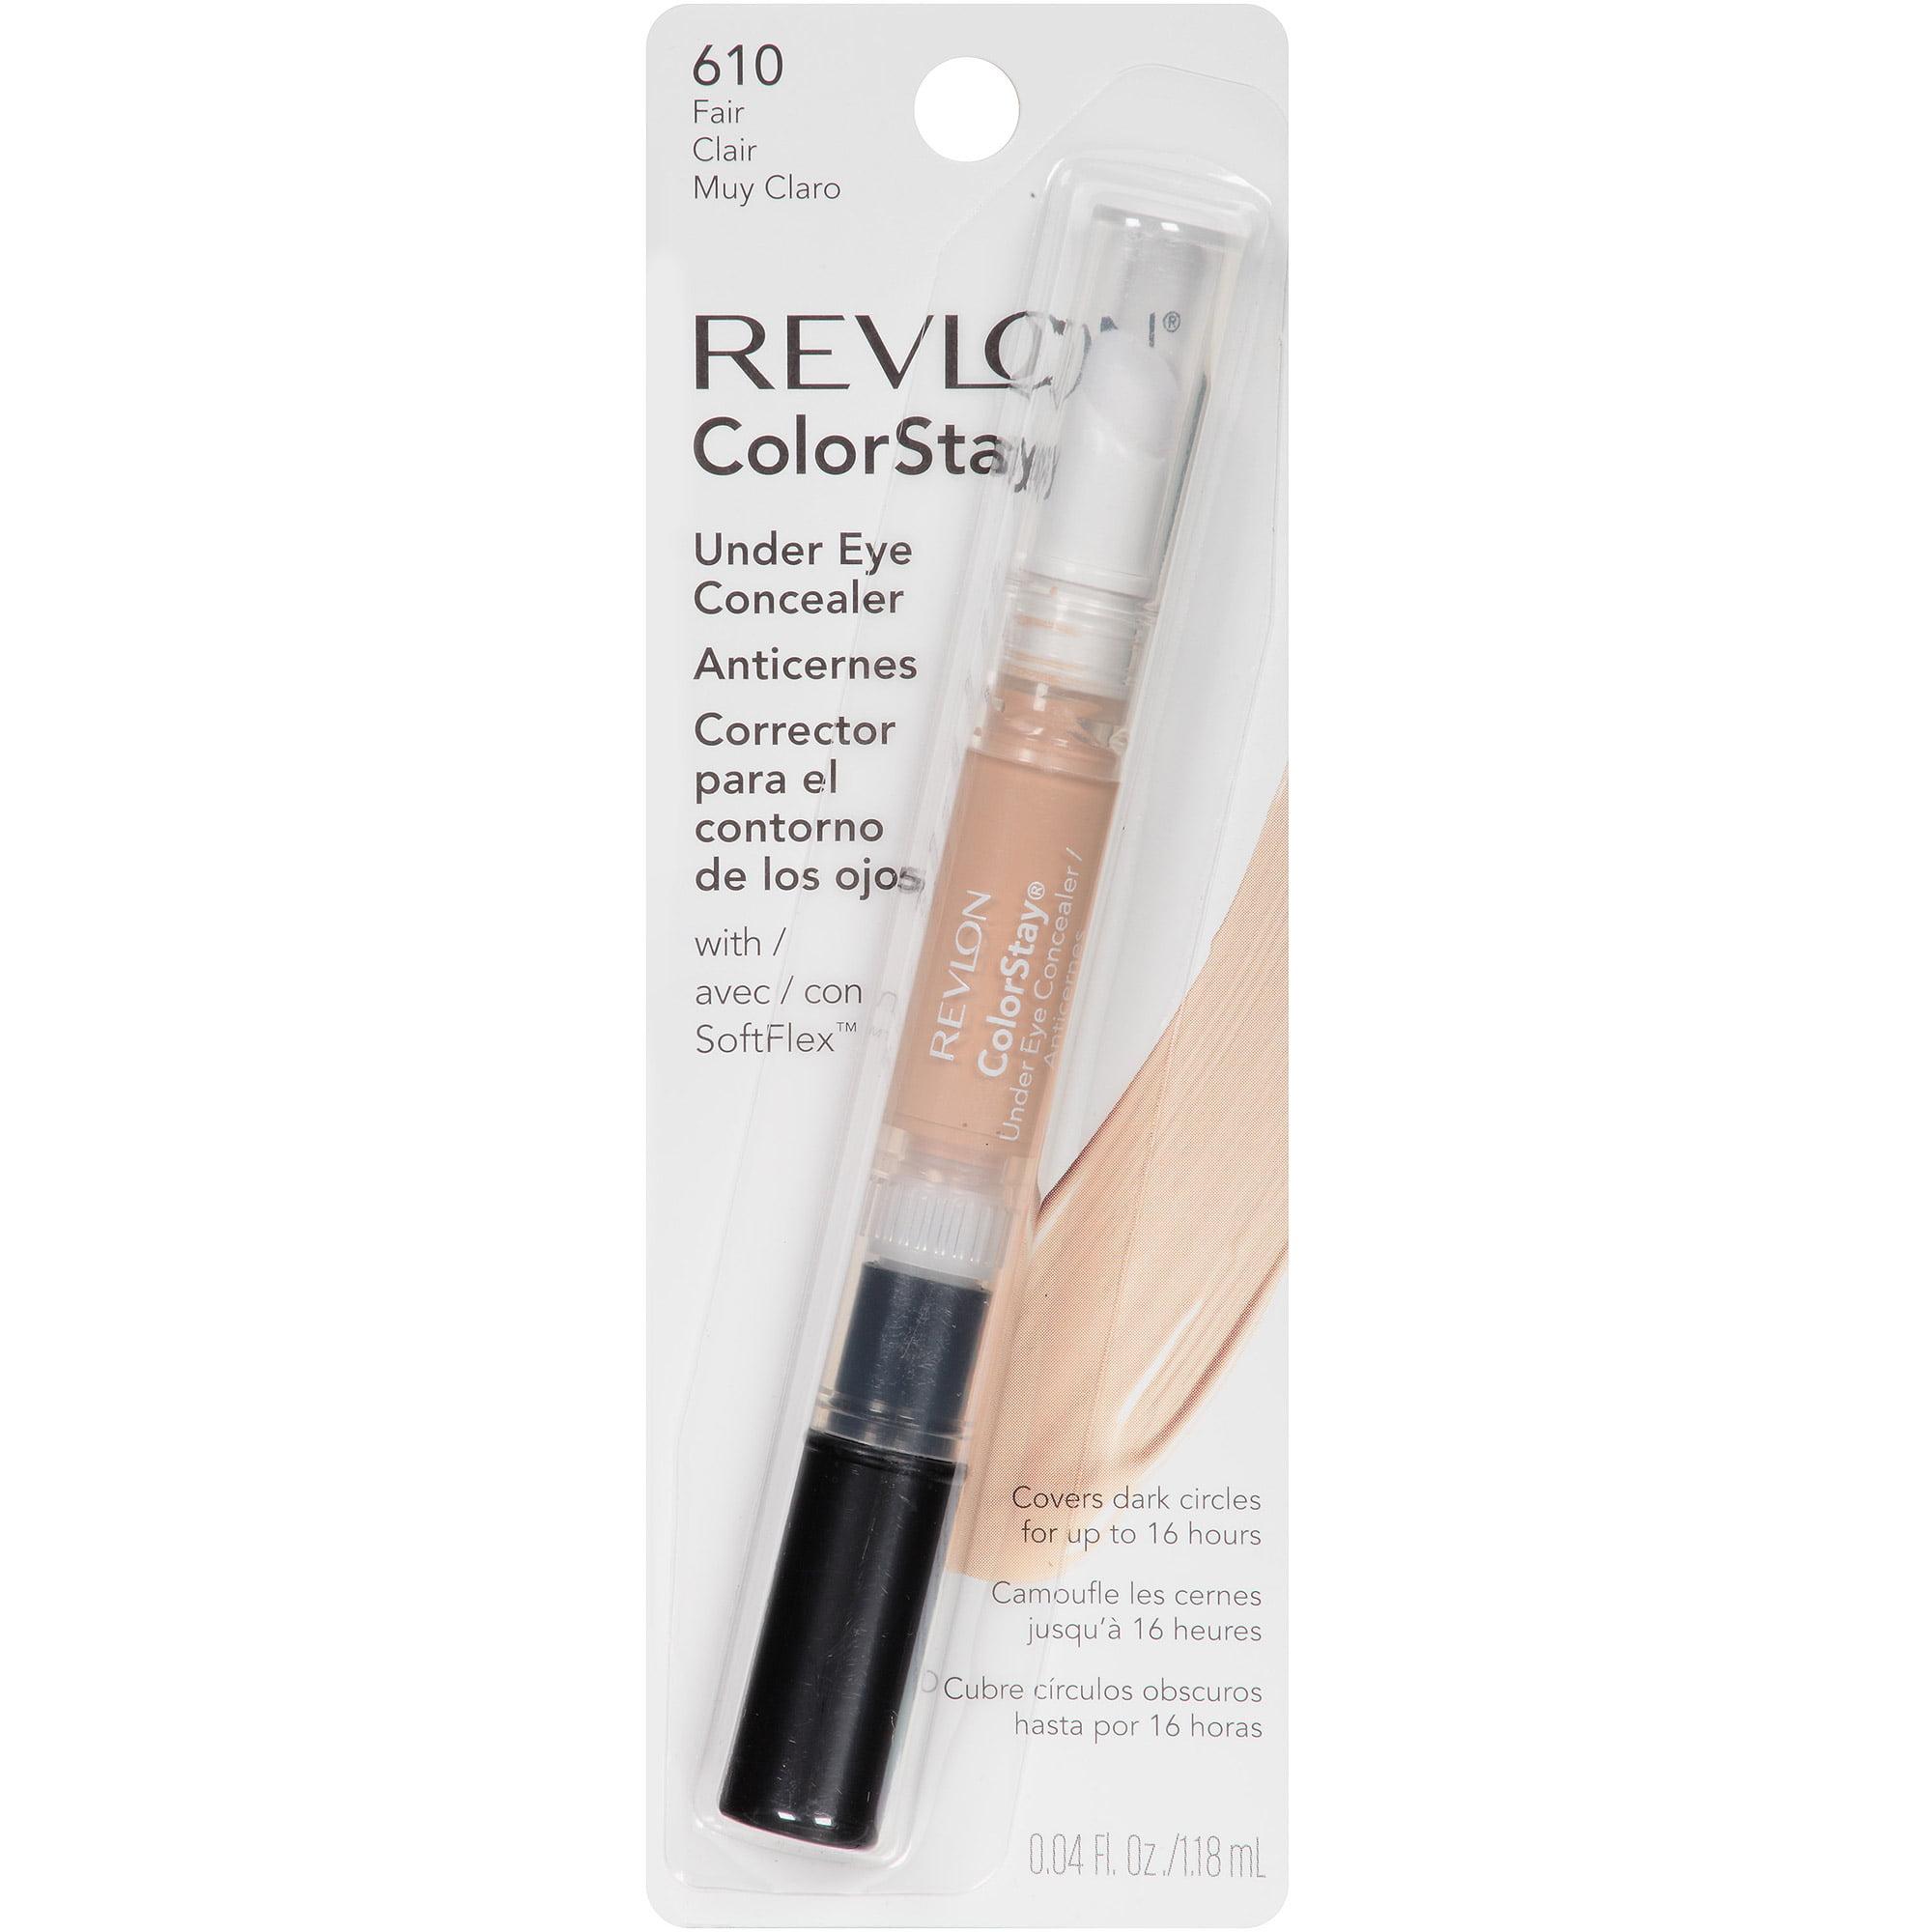 Revlon ColorStay Under Eye Concealer, 610 Fair, 0.04 fl oz